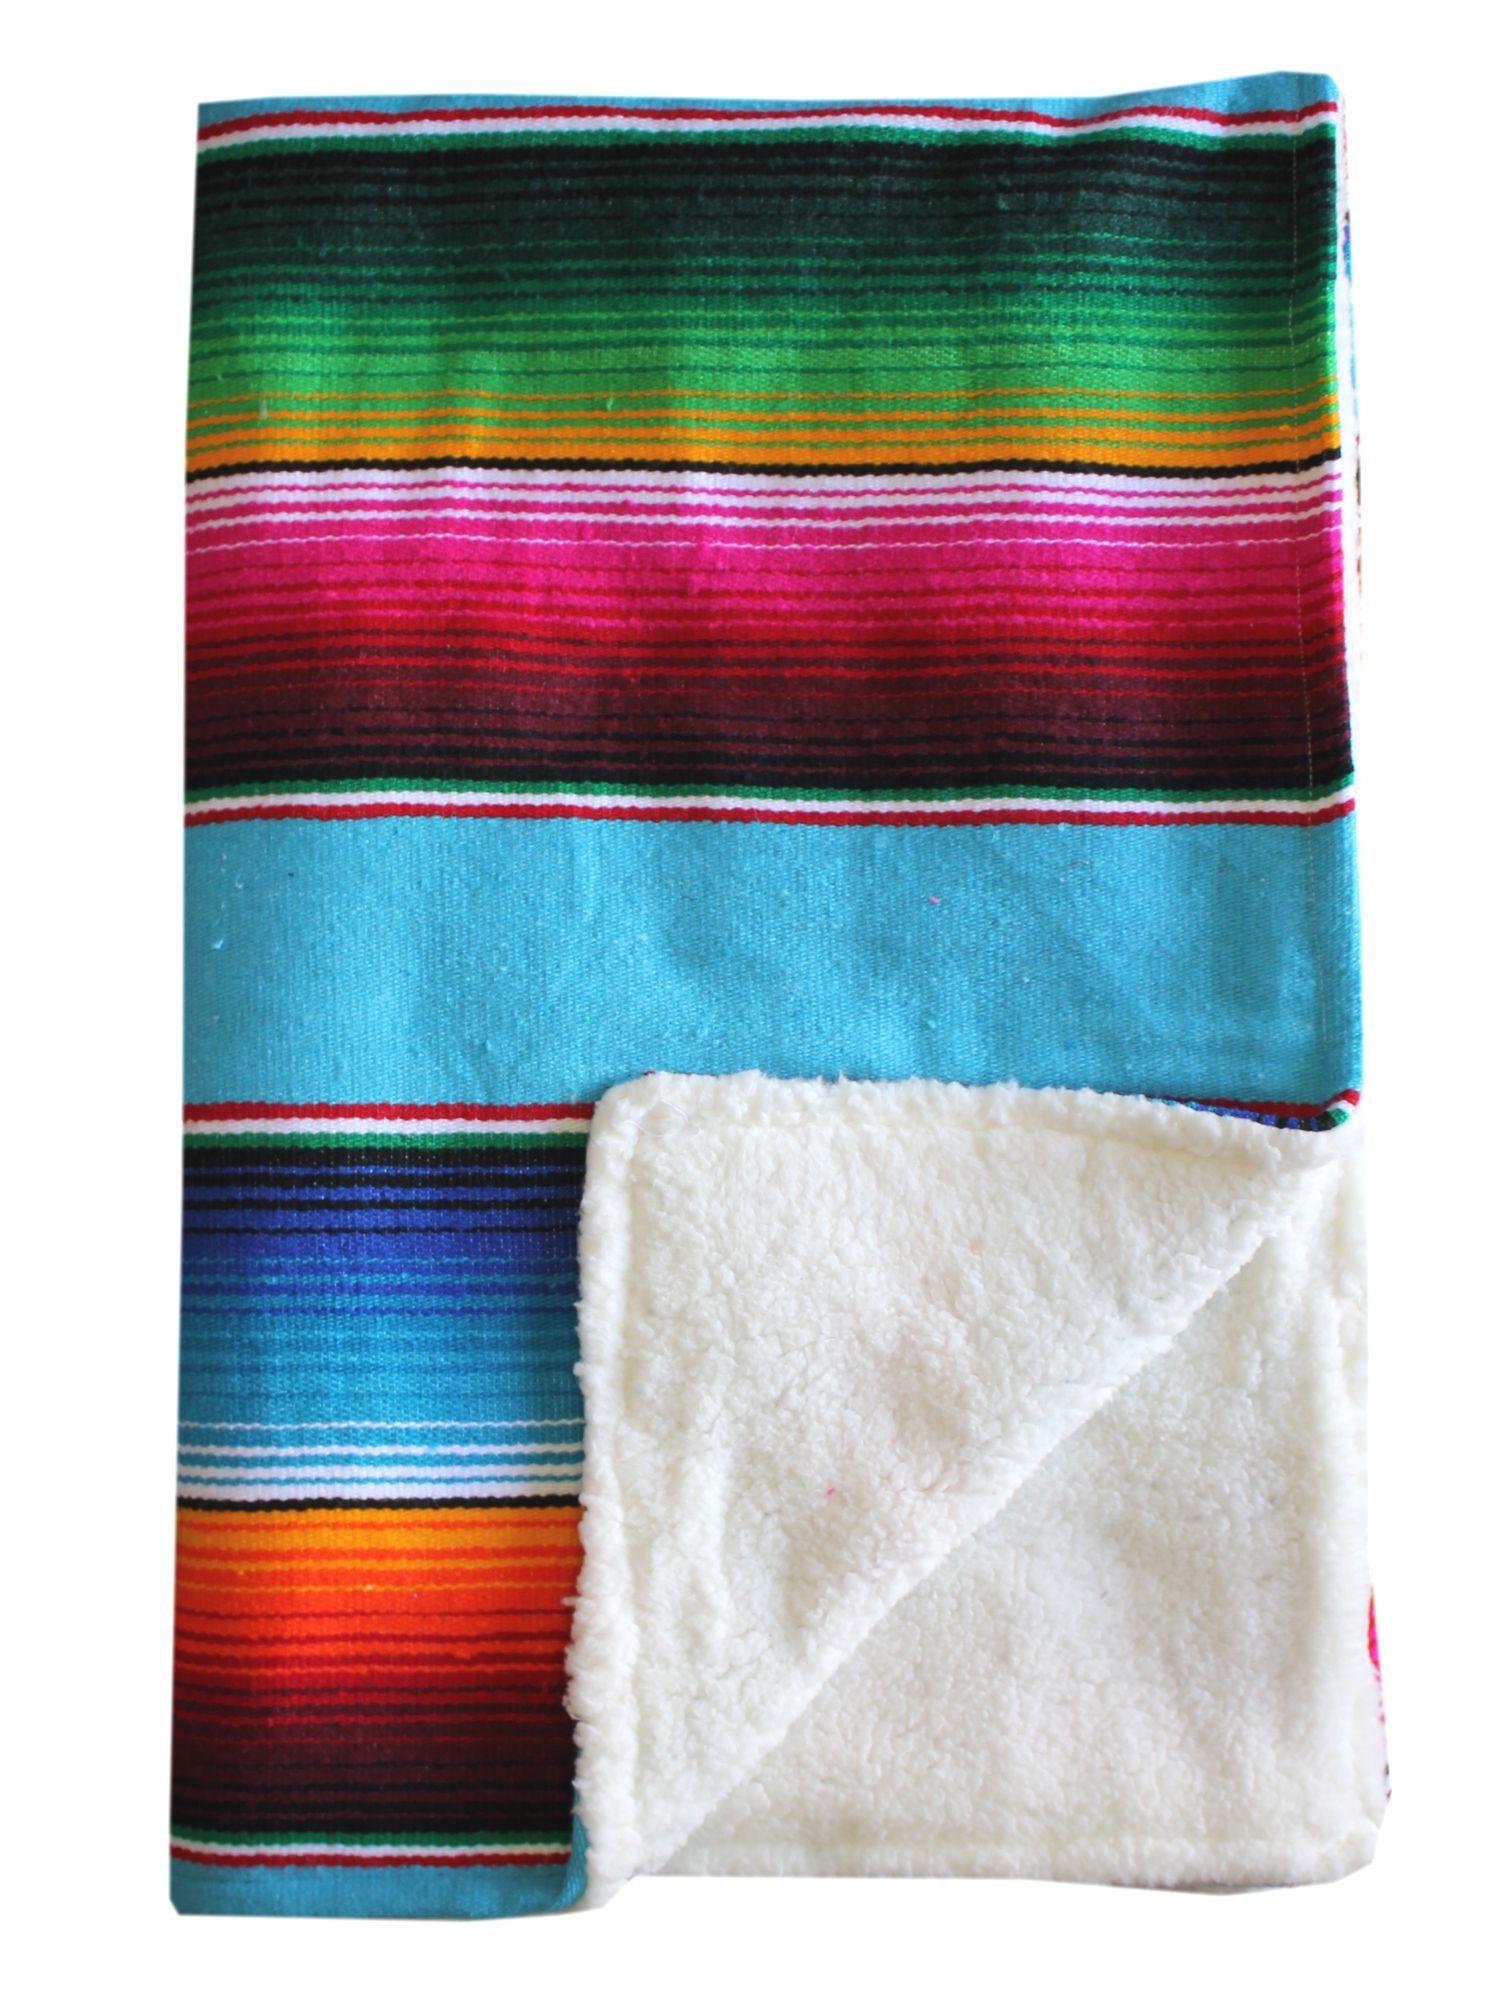 Baja Baby™ Mexican Serape Baby Blanket -Turquoise | Blanket ...